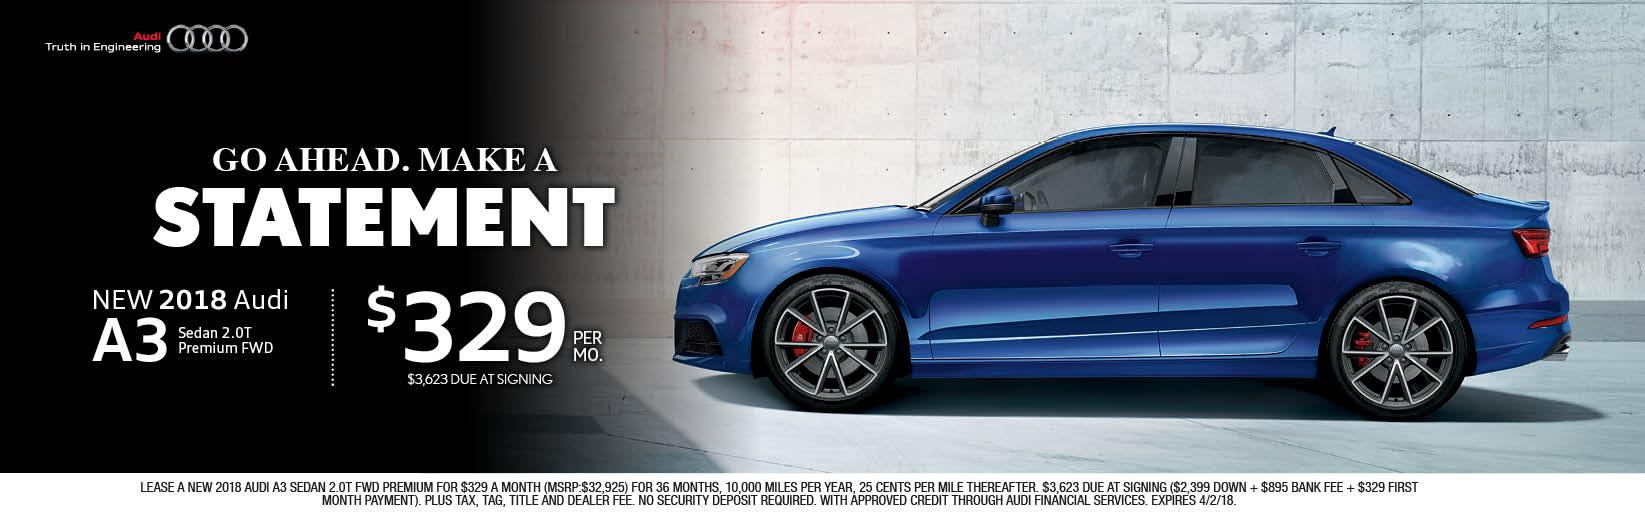 New PreOwned Audi Dealership Near Smithtown NY - Audi dealer long island